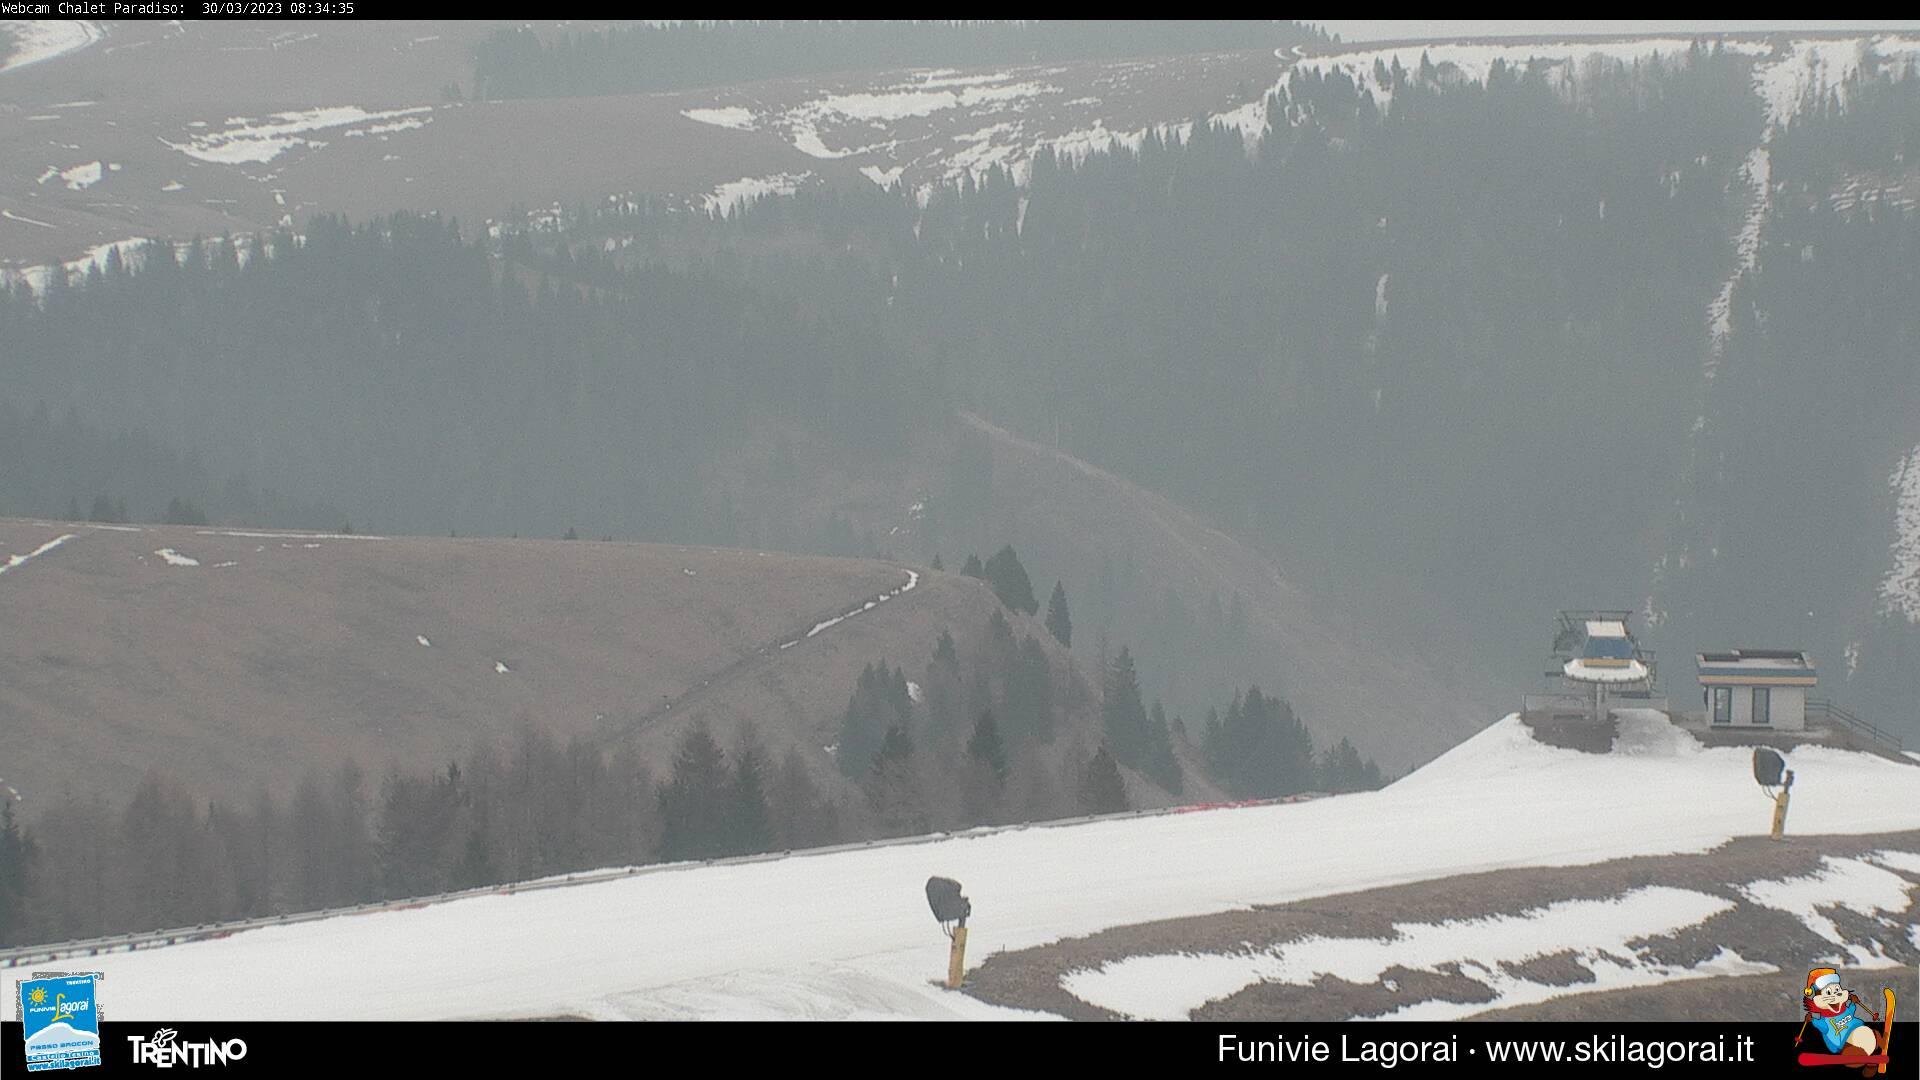 Webcam Lagorai - Passo Passo Brocon Pista Paradiso